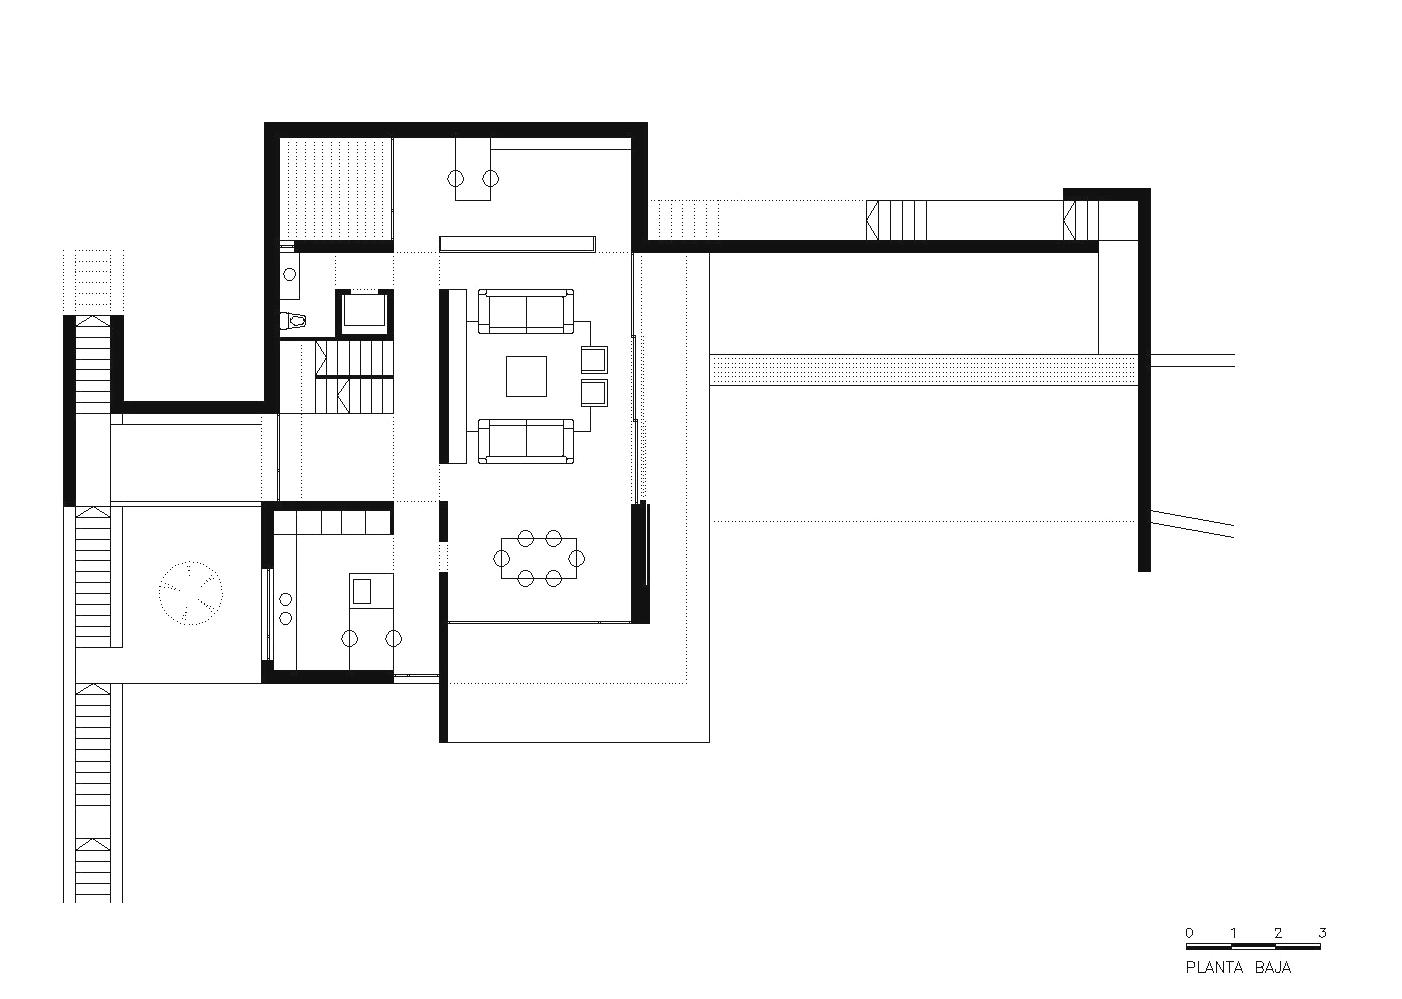 Casa a m planta baja wikiarquitectura for Casa de planta baja